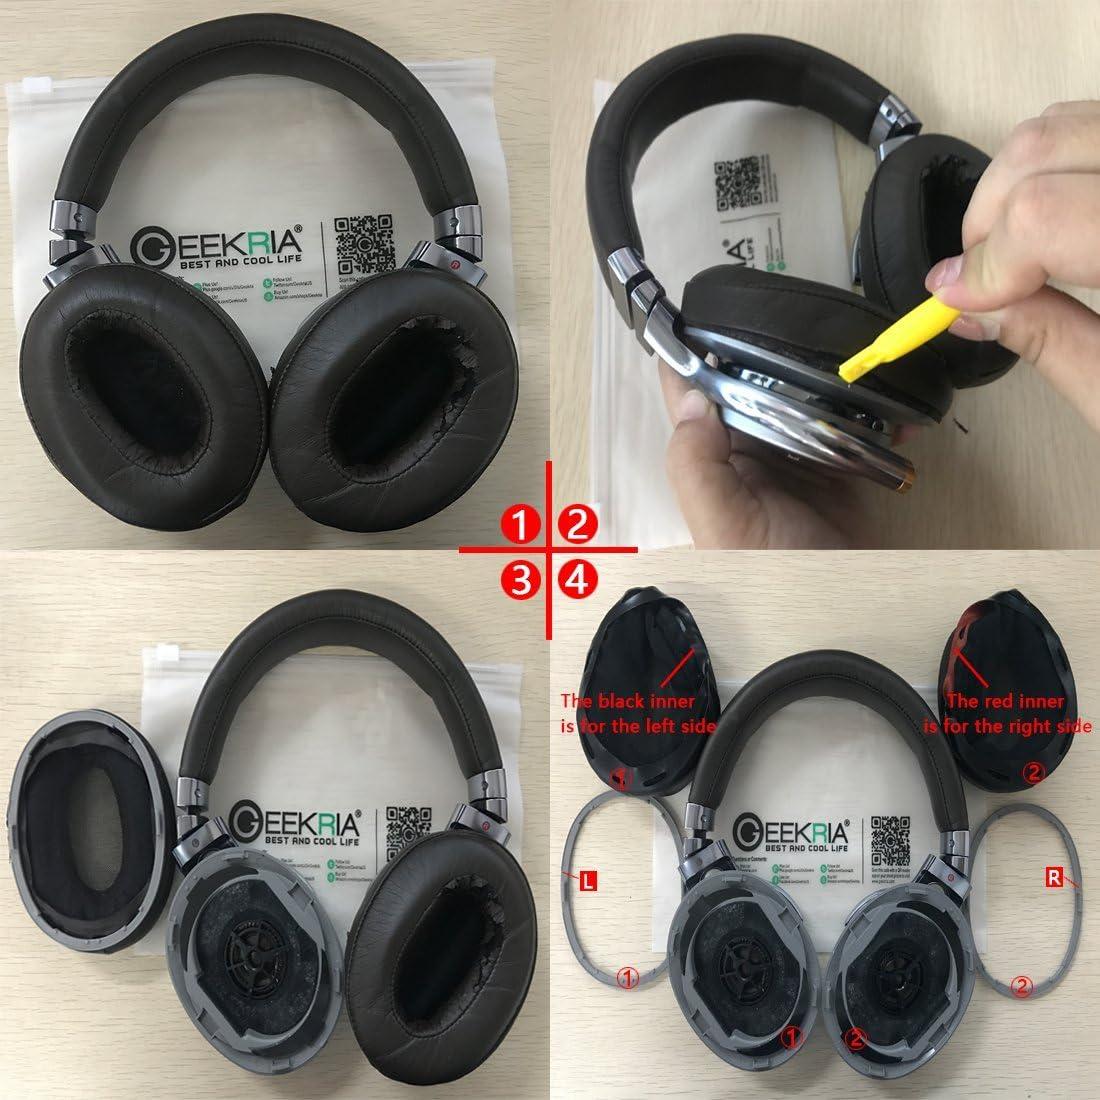 MDR-1RMK2 Headphone Ear Pad//Ear Cushion//Ear Cups//Ear Cover//Earpads Repair Parts Geekria Earpad for MDR-1R Black